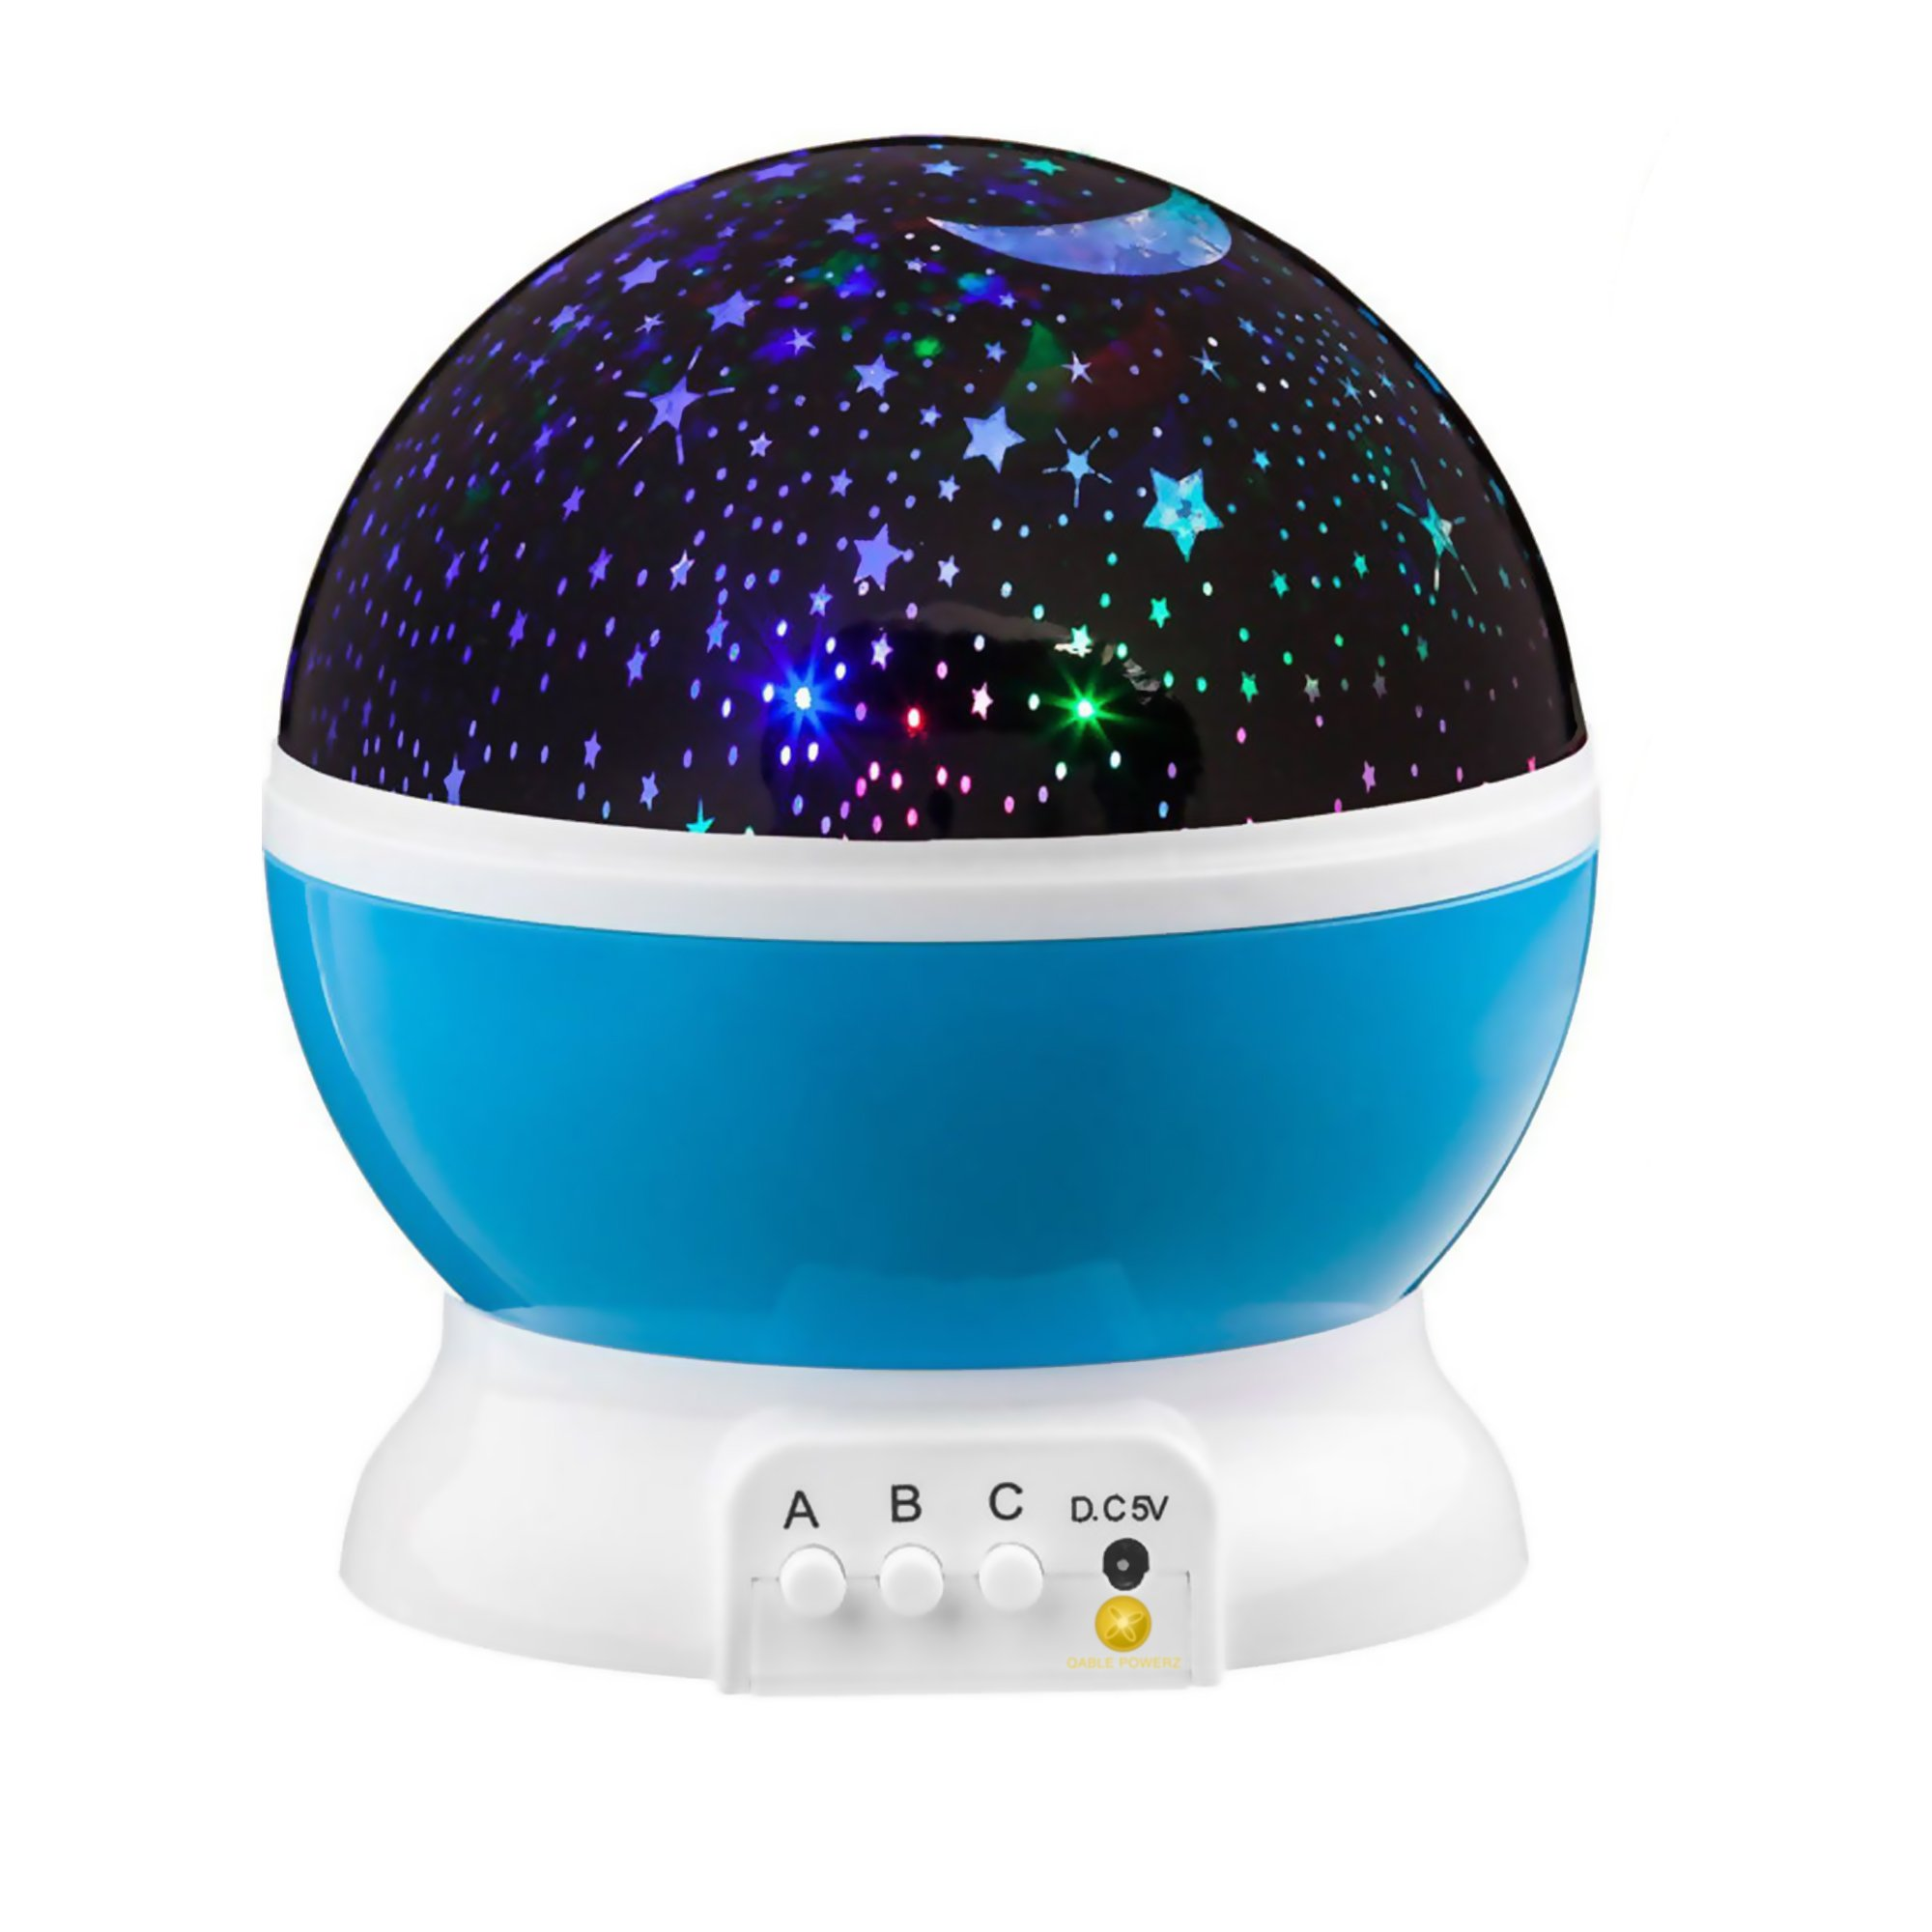 LED Projector Night Lights, Captivating Galaxy Night Sky Rotating LED Projector Ball Lamp Multi-Color Nursery Room Night Lightning Lamp (Blue)